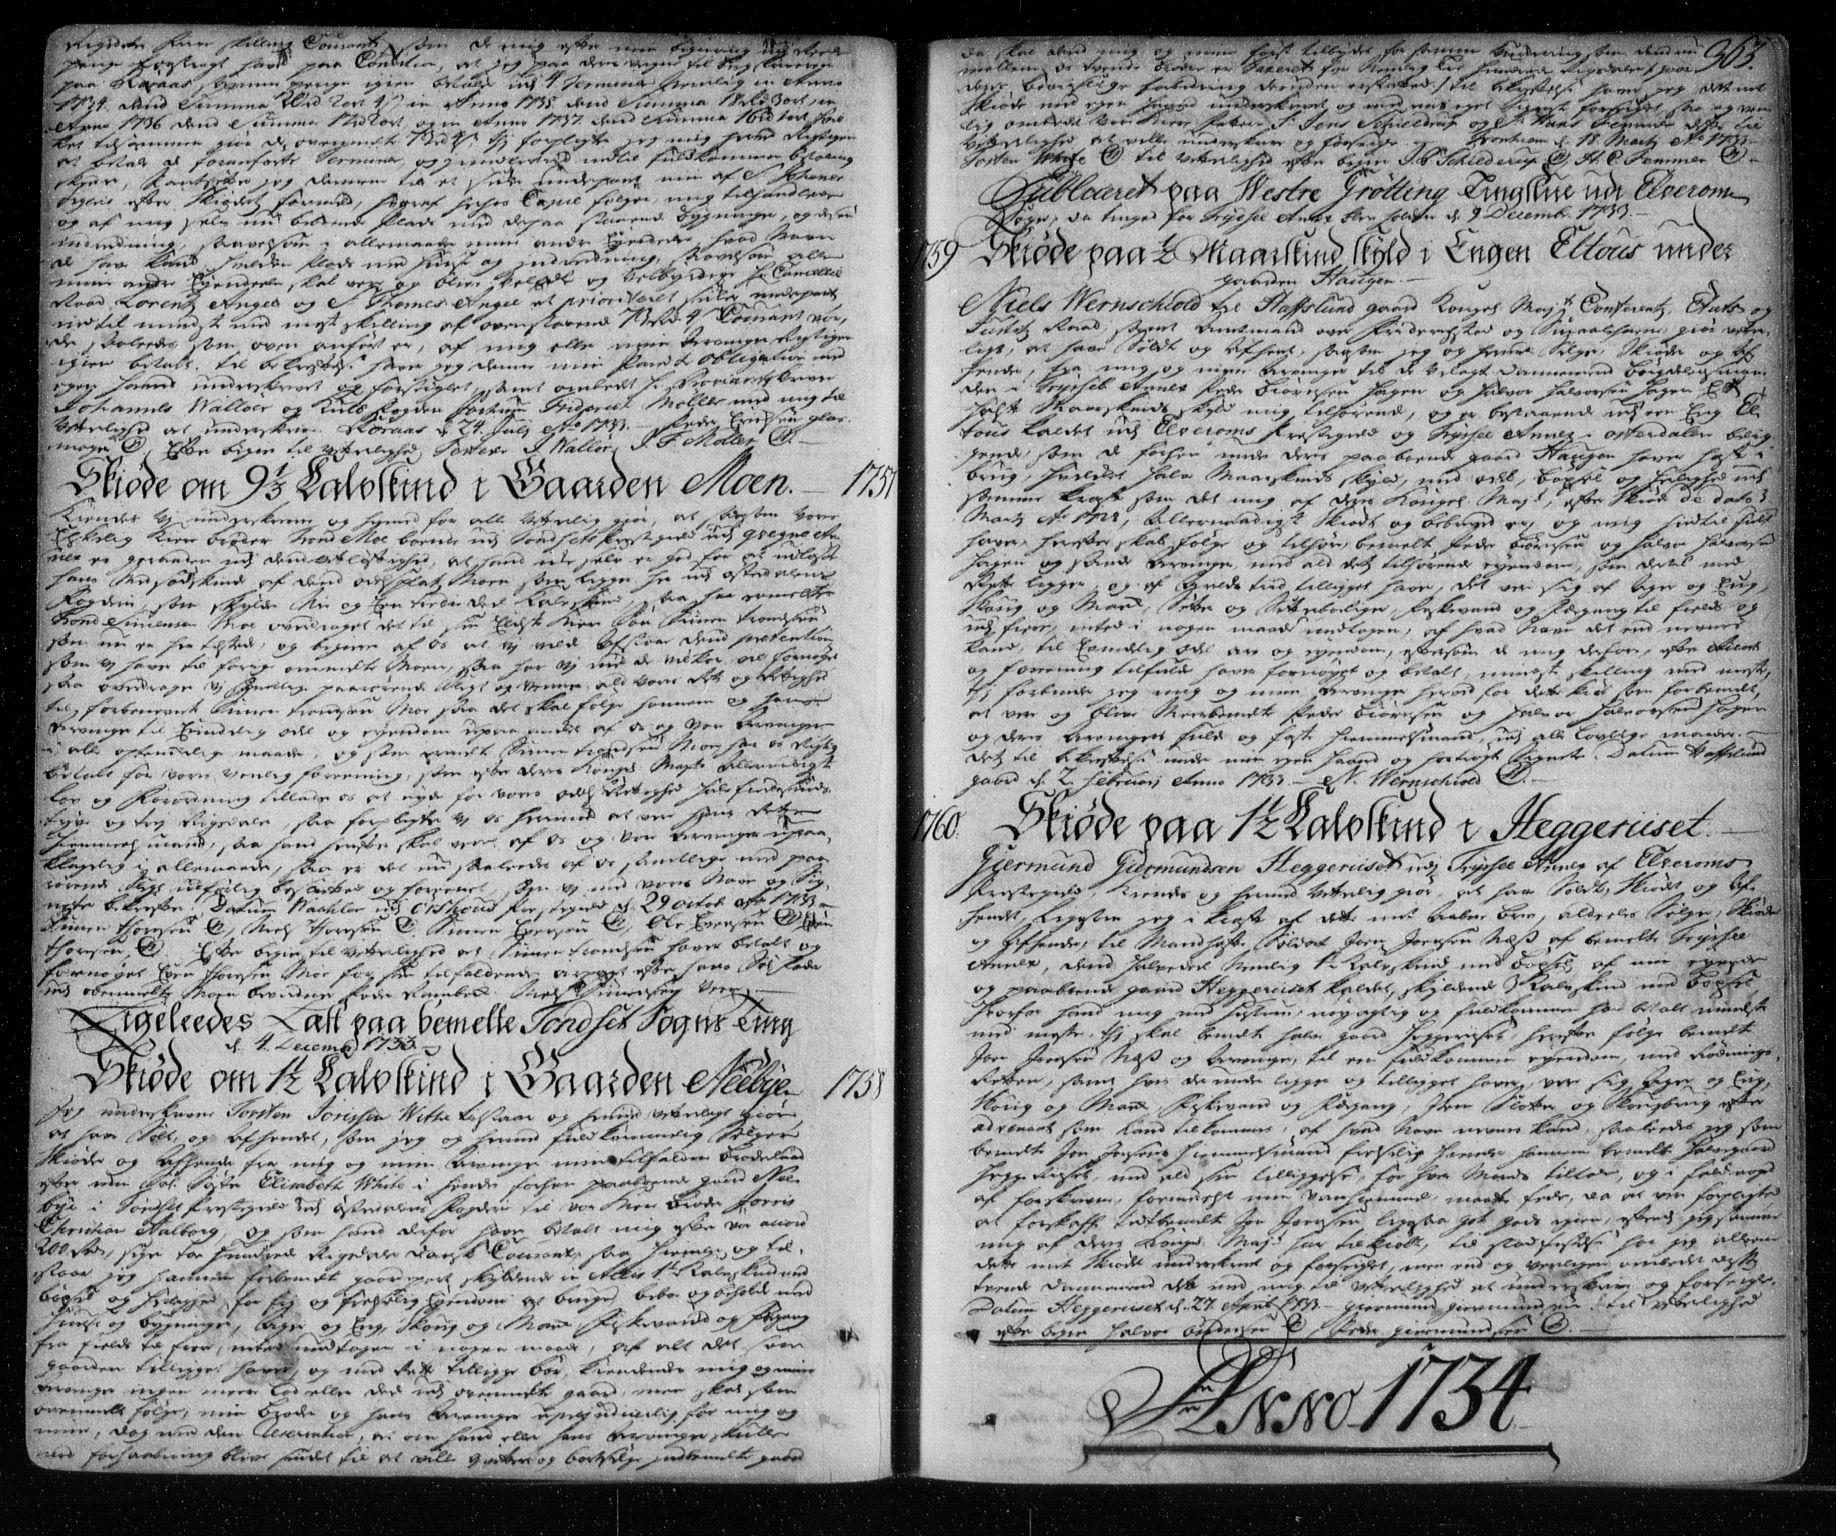 SAH, Solør og Østerdalen sorenskriveri, H/Hb/Hba/L0002: Pantebok nr. 2, 1716-1736, s. 363